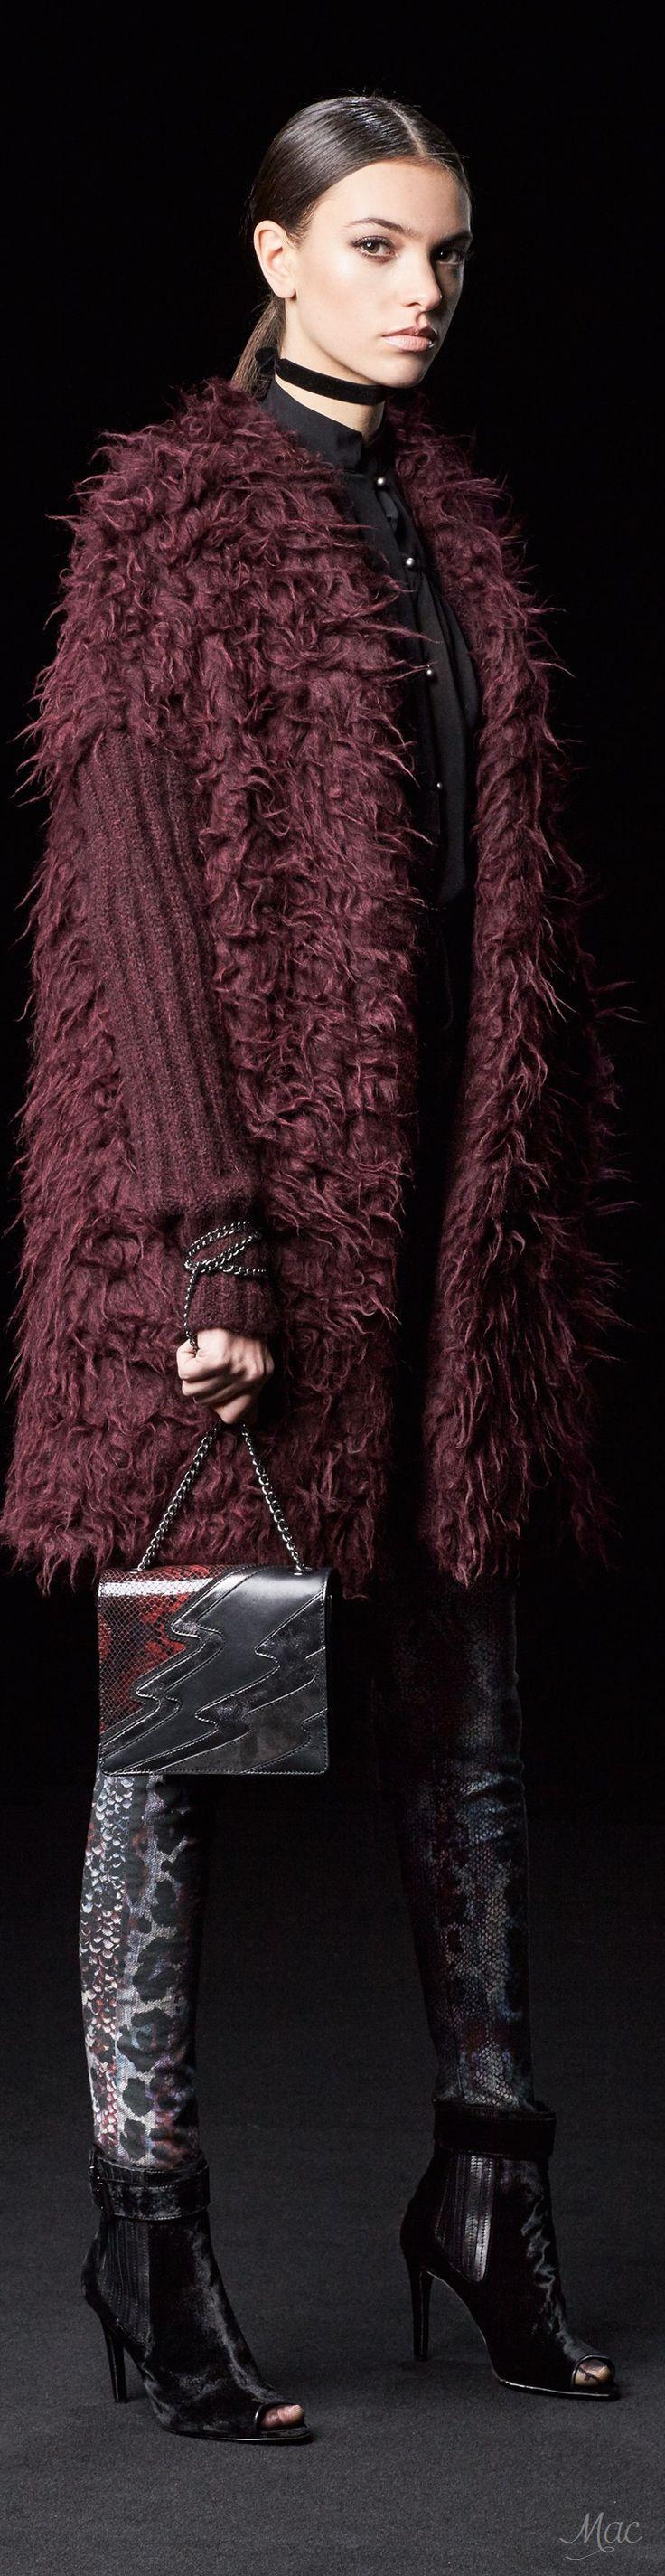 Just Cavalli Pre F-17: burgundy furry coat, black blouse, animal print pants, booties.